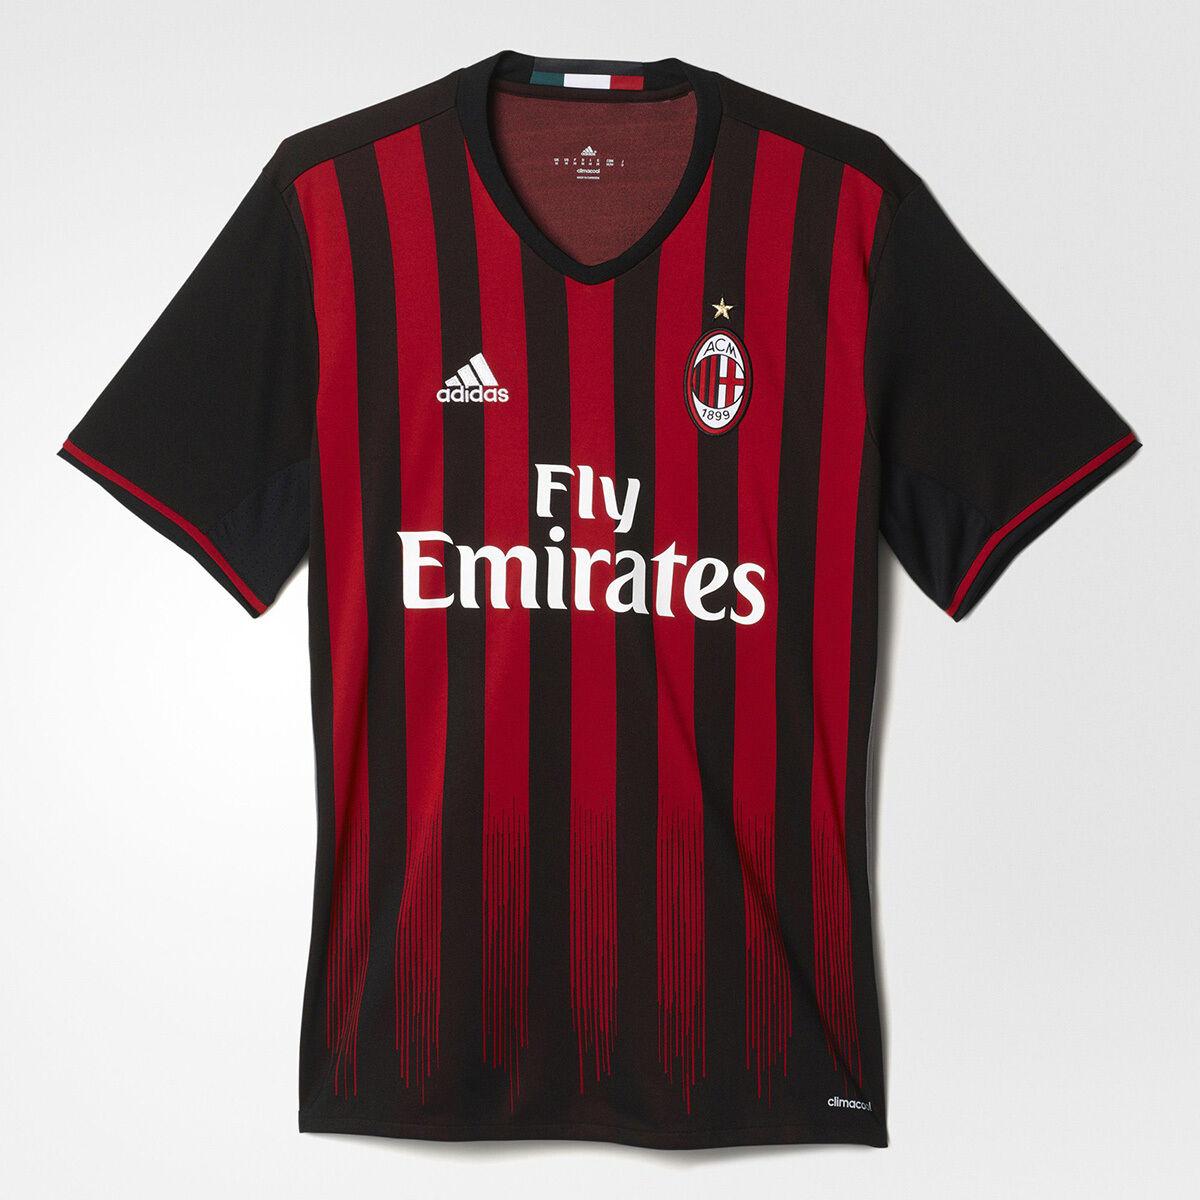 Adidas AC Milan Home Replica Jersey NEW men AP7964 schwarz Weiß rot bordo